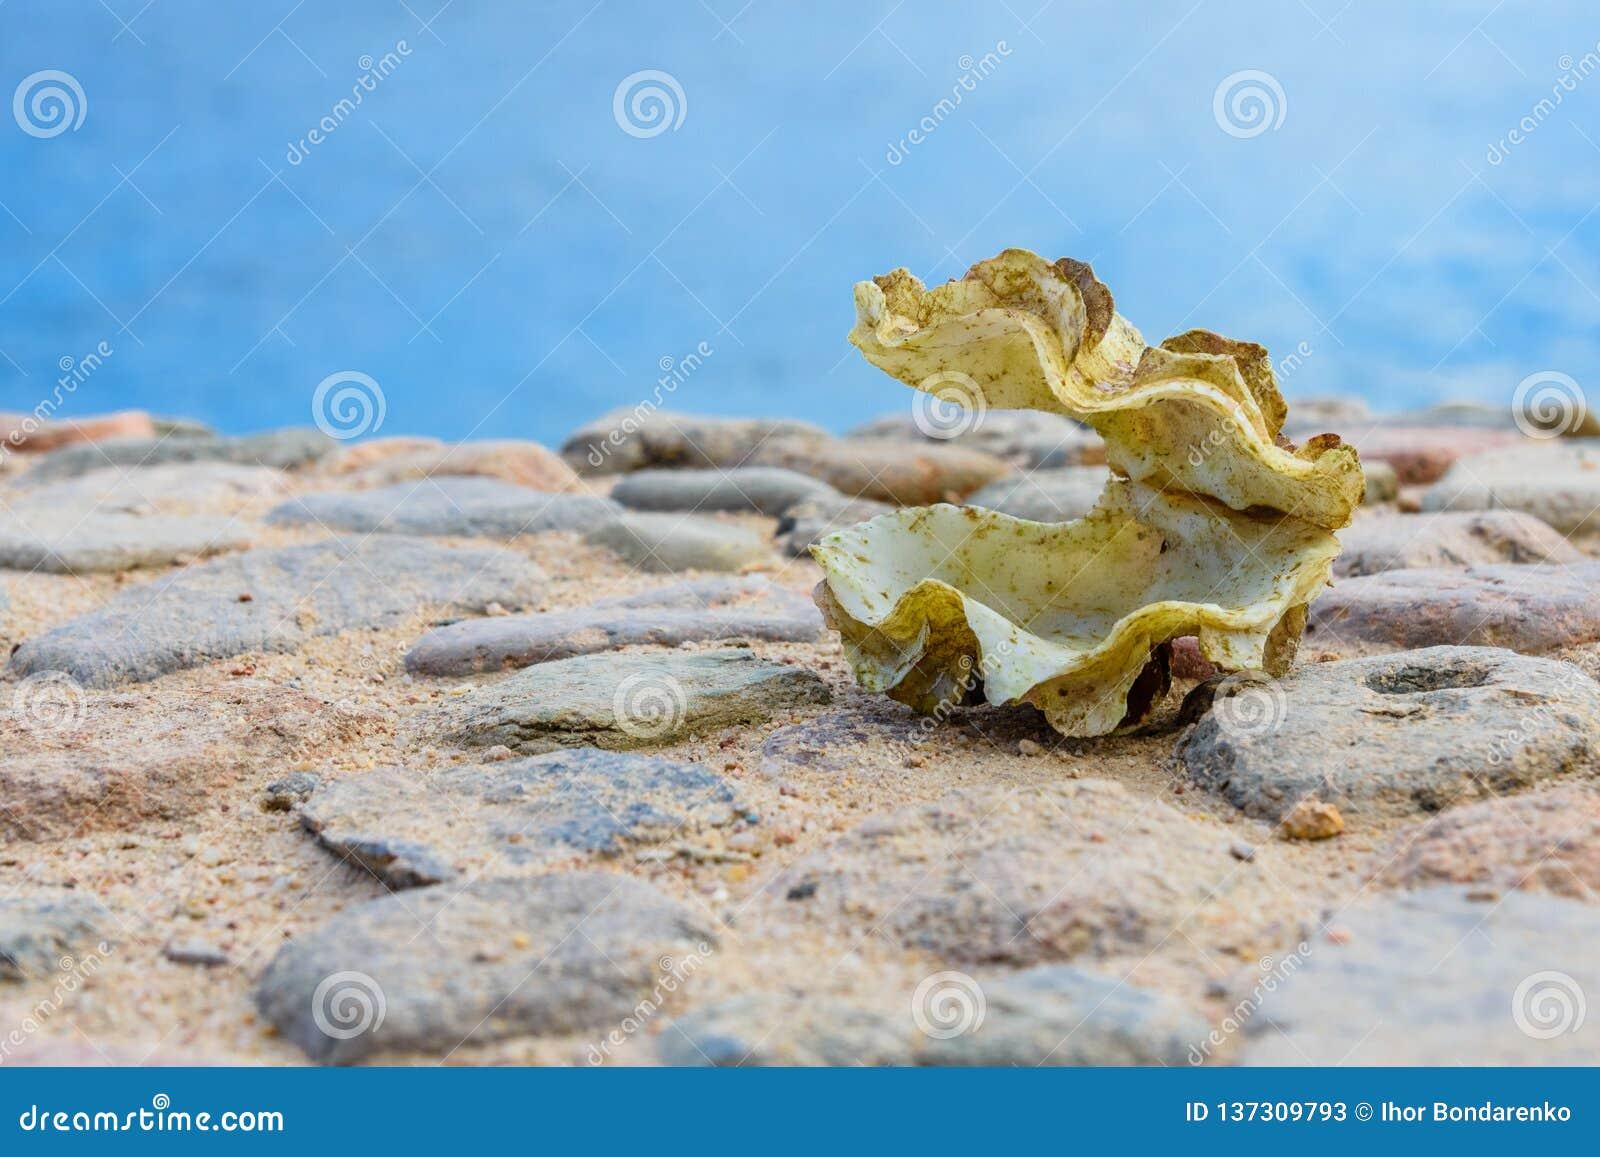 Shell du mollusque de tridacna La Mer Rouge sur le fond